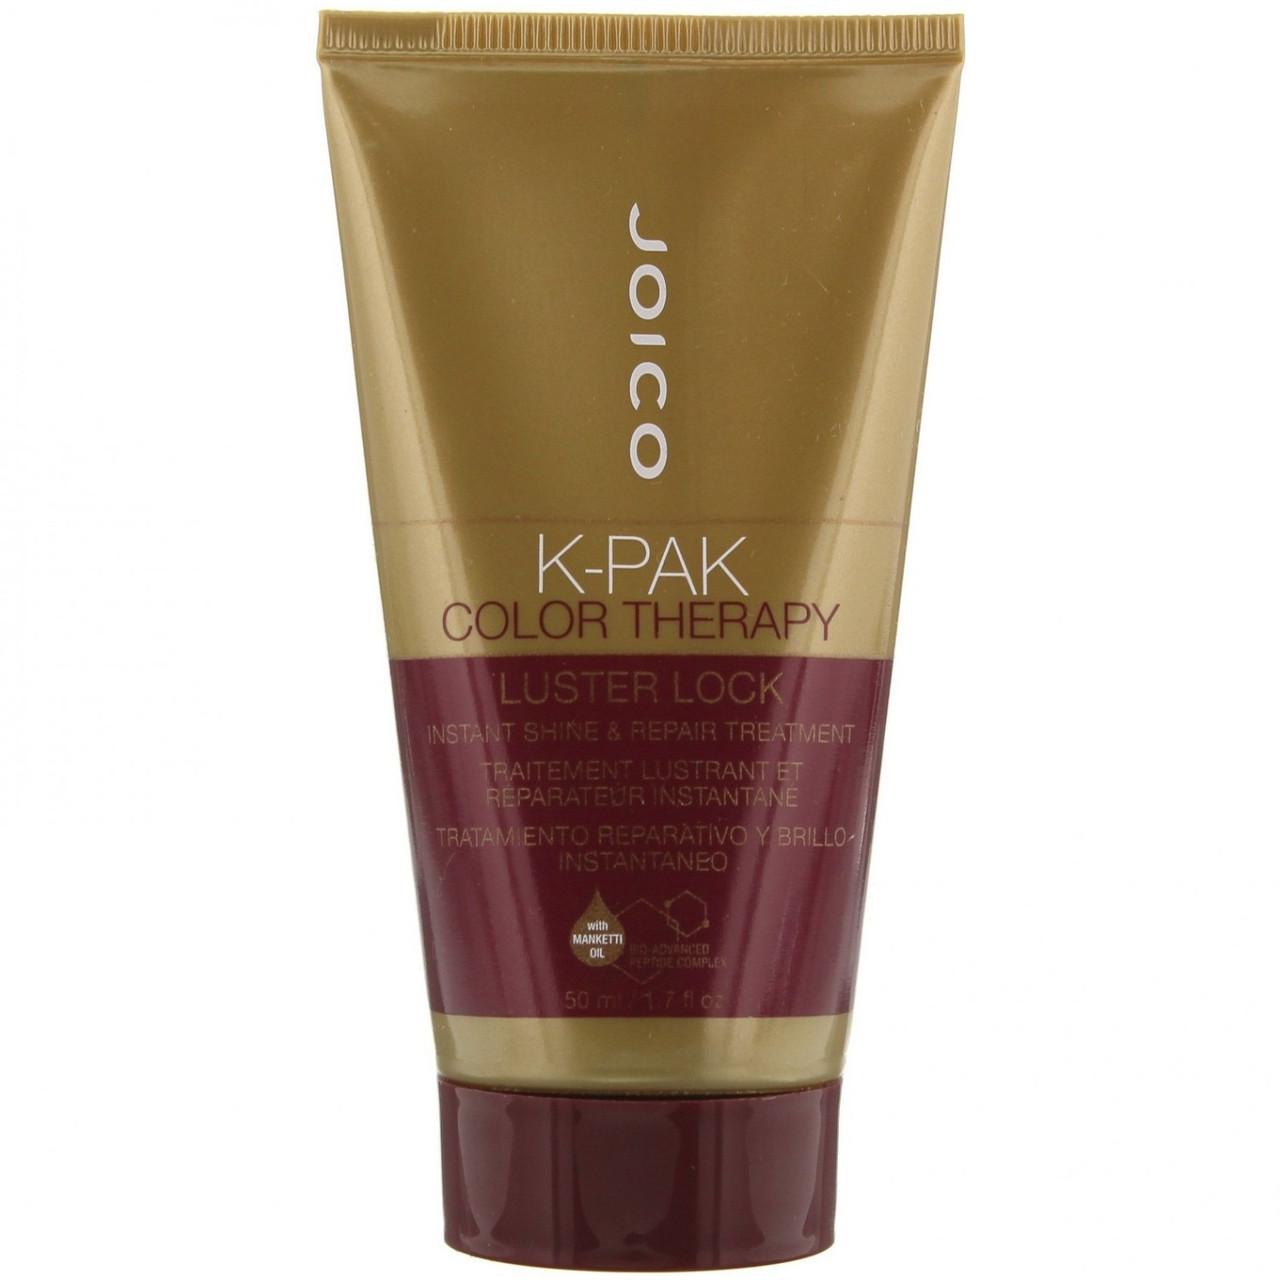 Joico K-Pak Color Therapy Luster Lock - Маска для защиты цвета и блеска волос, 50 ml